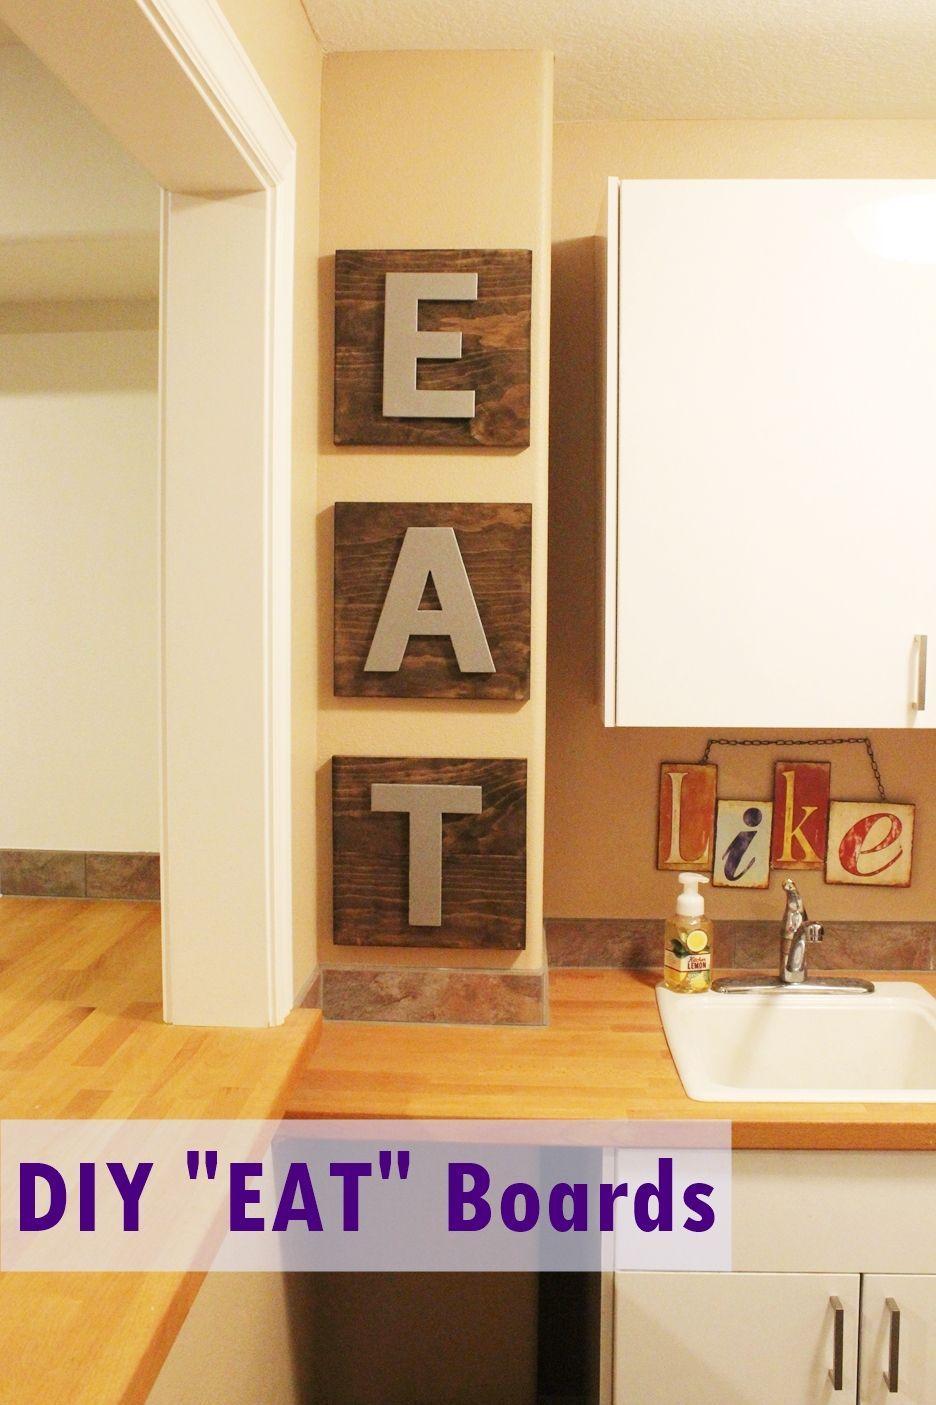 diy-eat-kitchen-decor-project